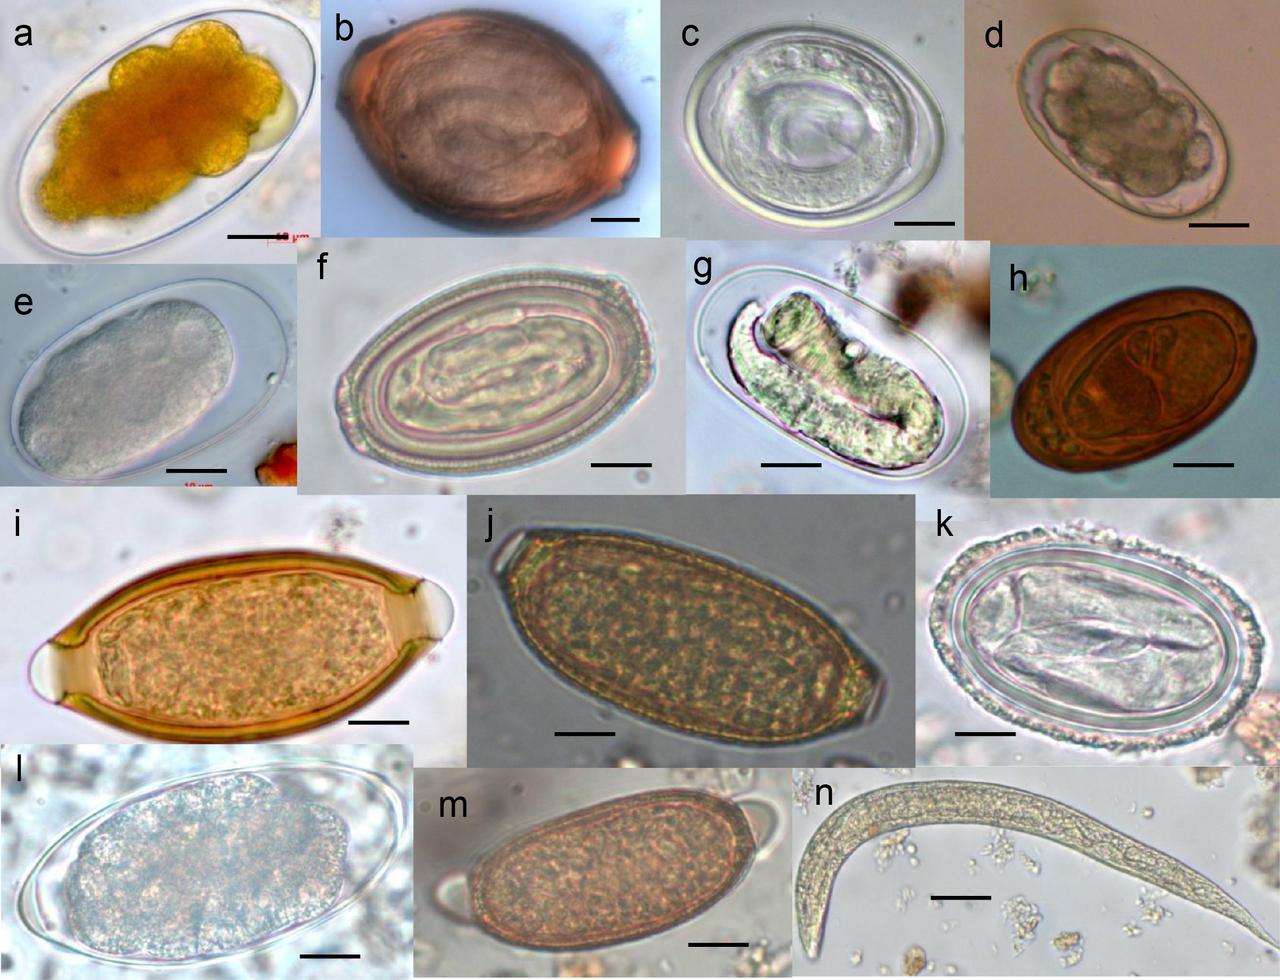 Helminth nematode worms. Helminths parasitic worms. Parasitic helminths glycans.